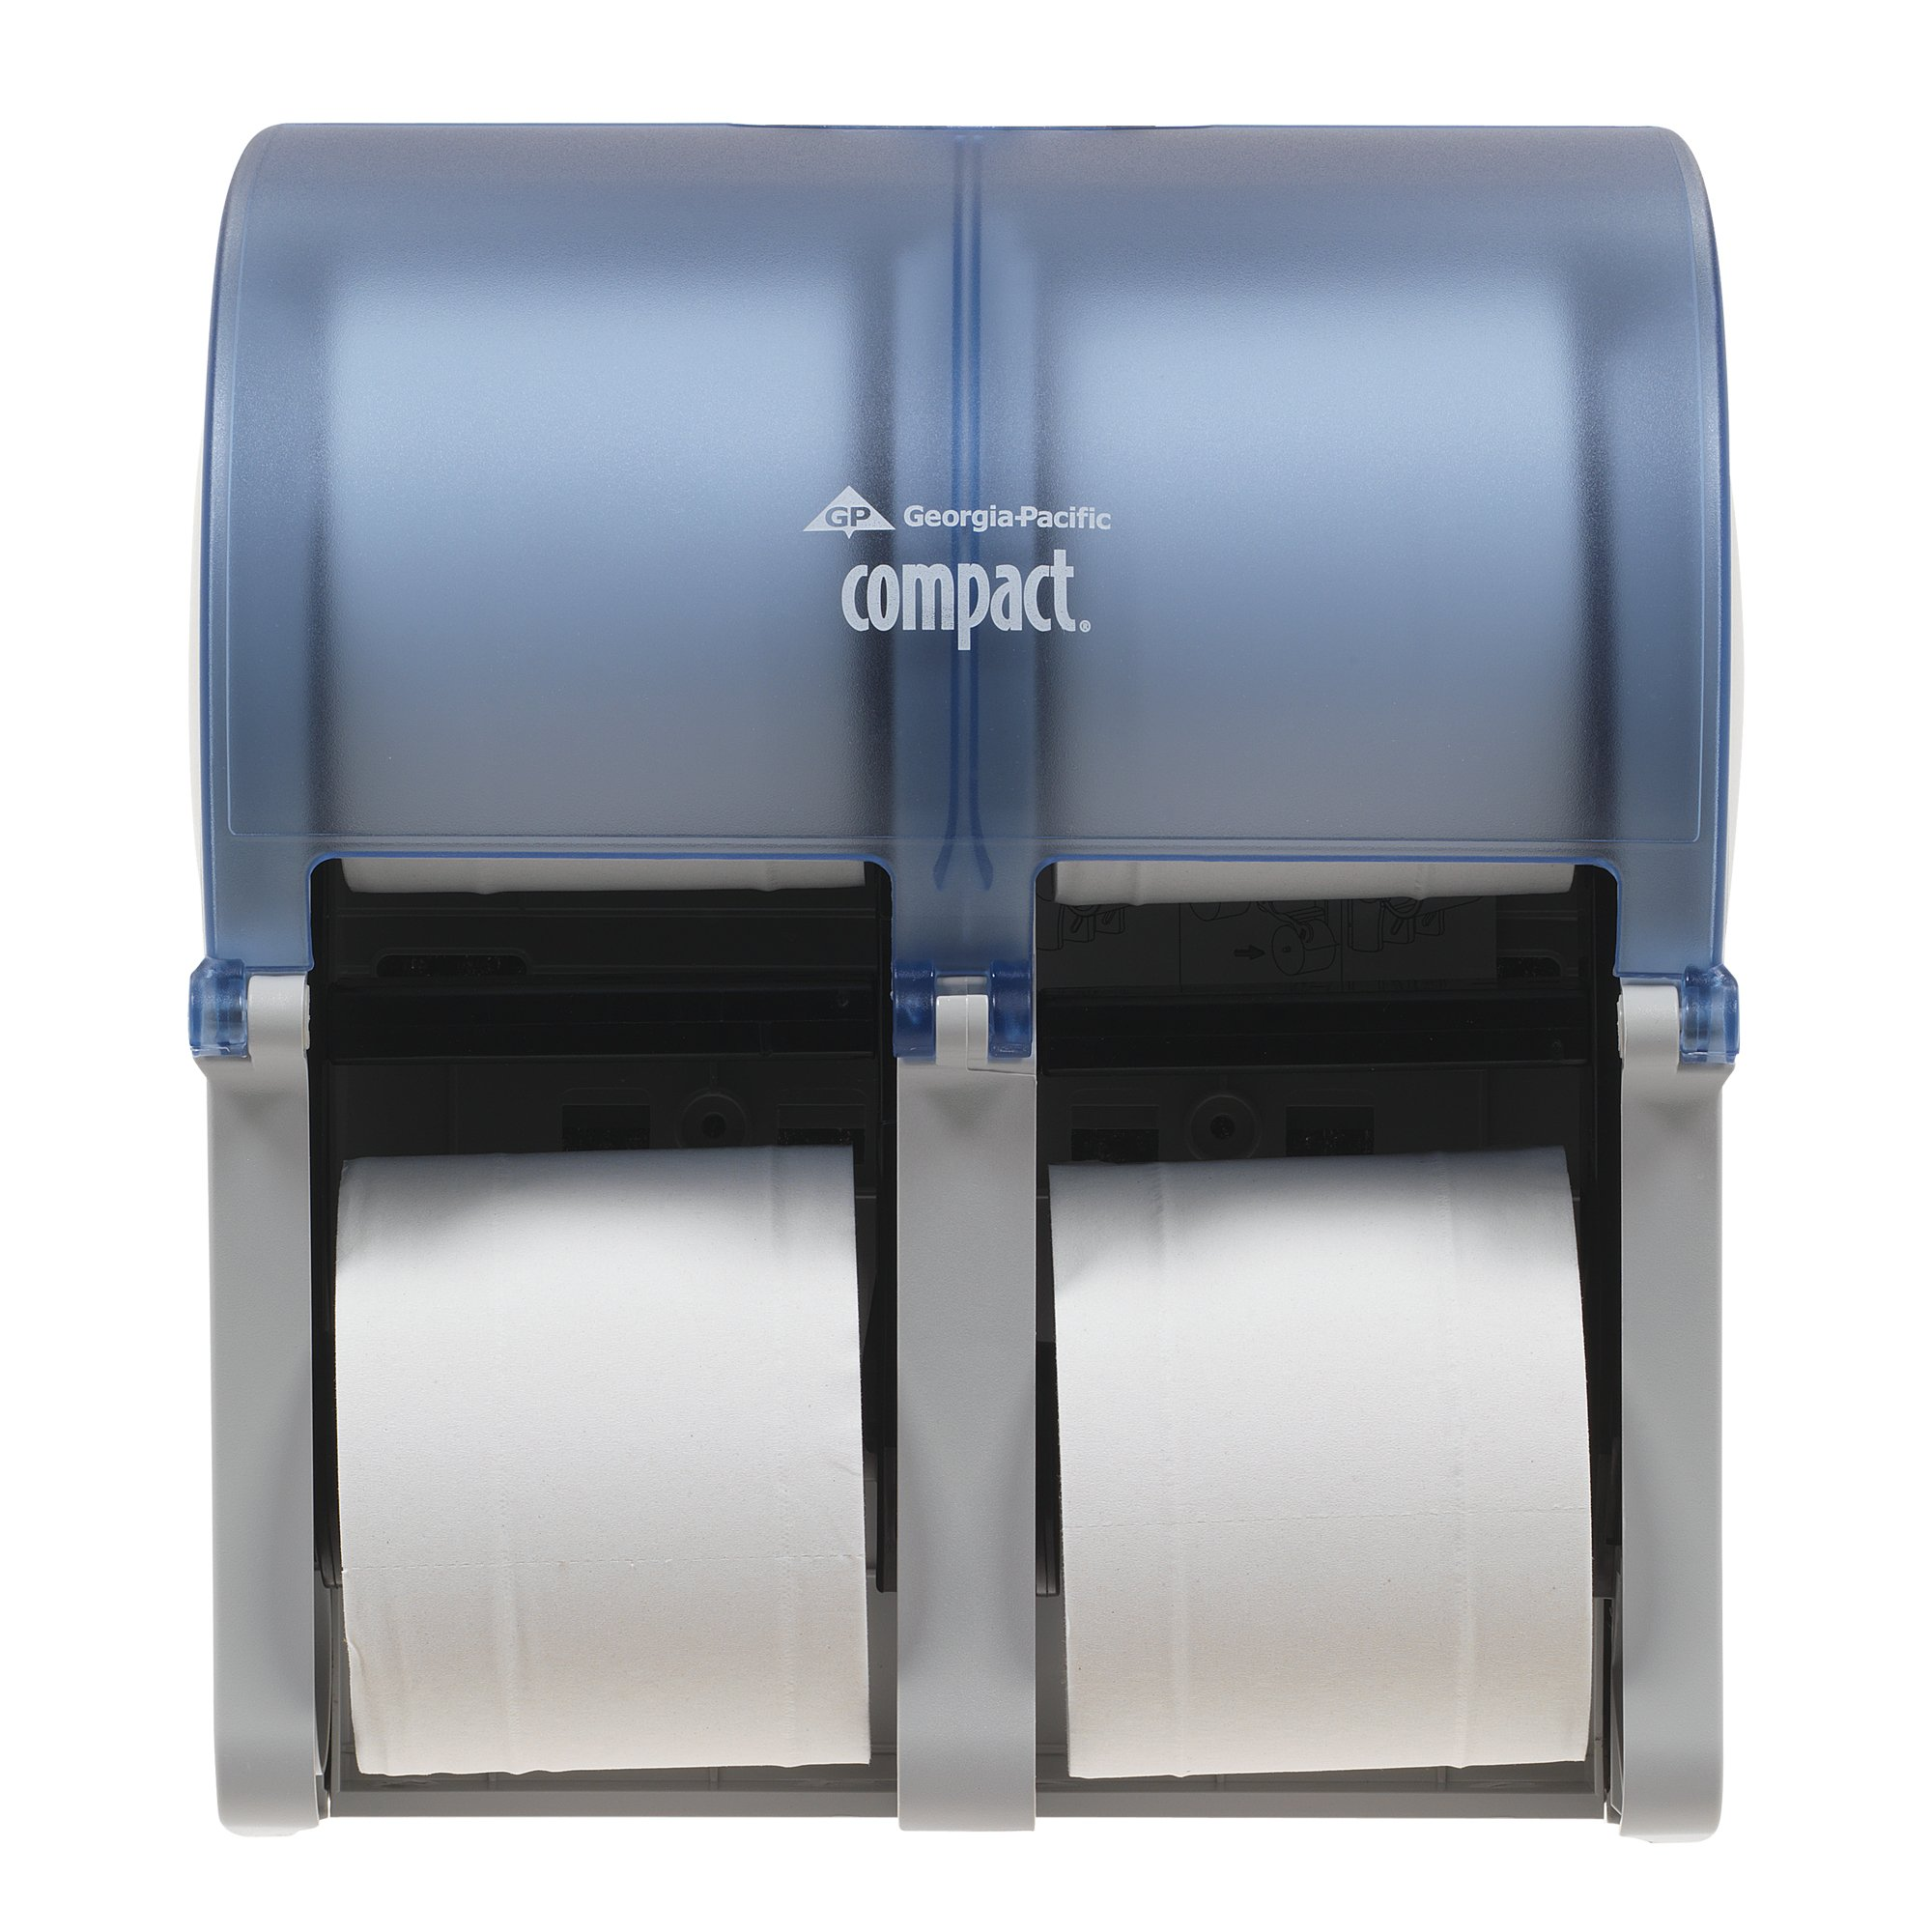 Georgia-Pacific Compact Quad 56743 Splash Blue Vertical Four Roll Coreless Tissue Dispenser (1 Each)